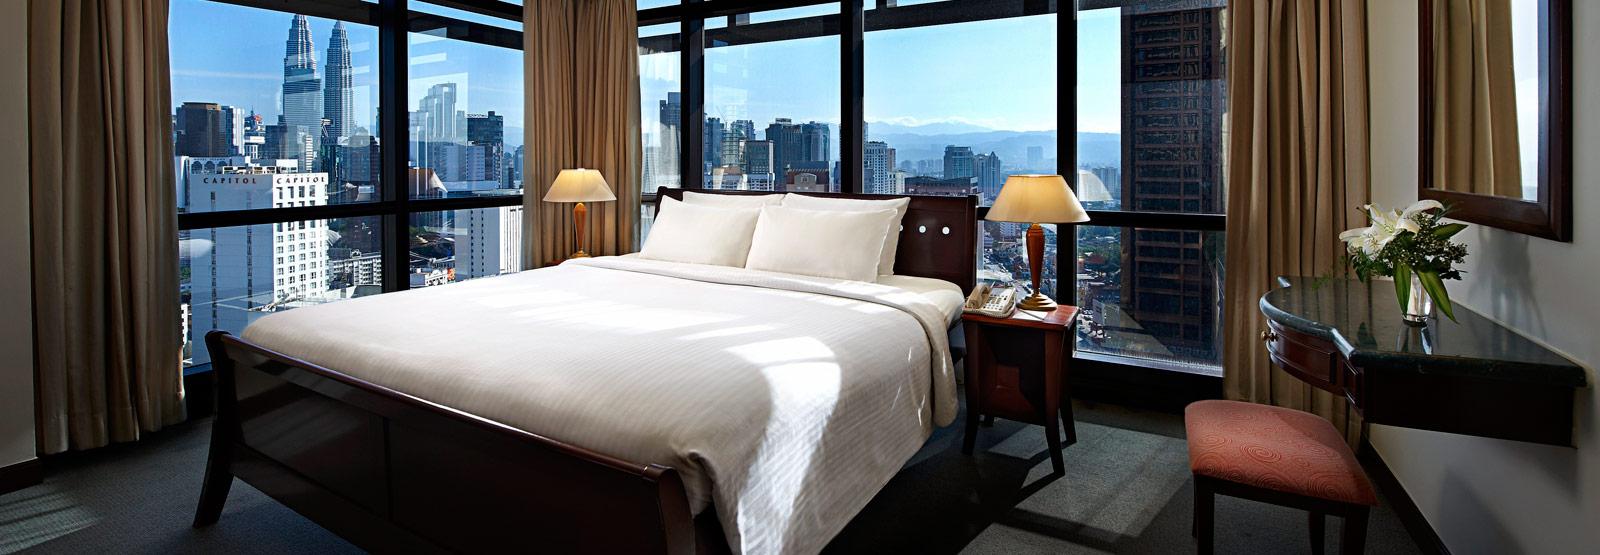 times square hotel kl 2 bedroom deluxe berjaya times square hotel